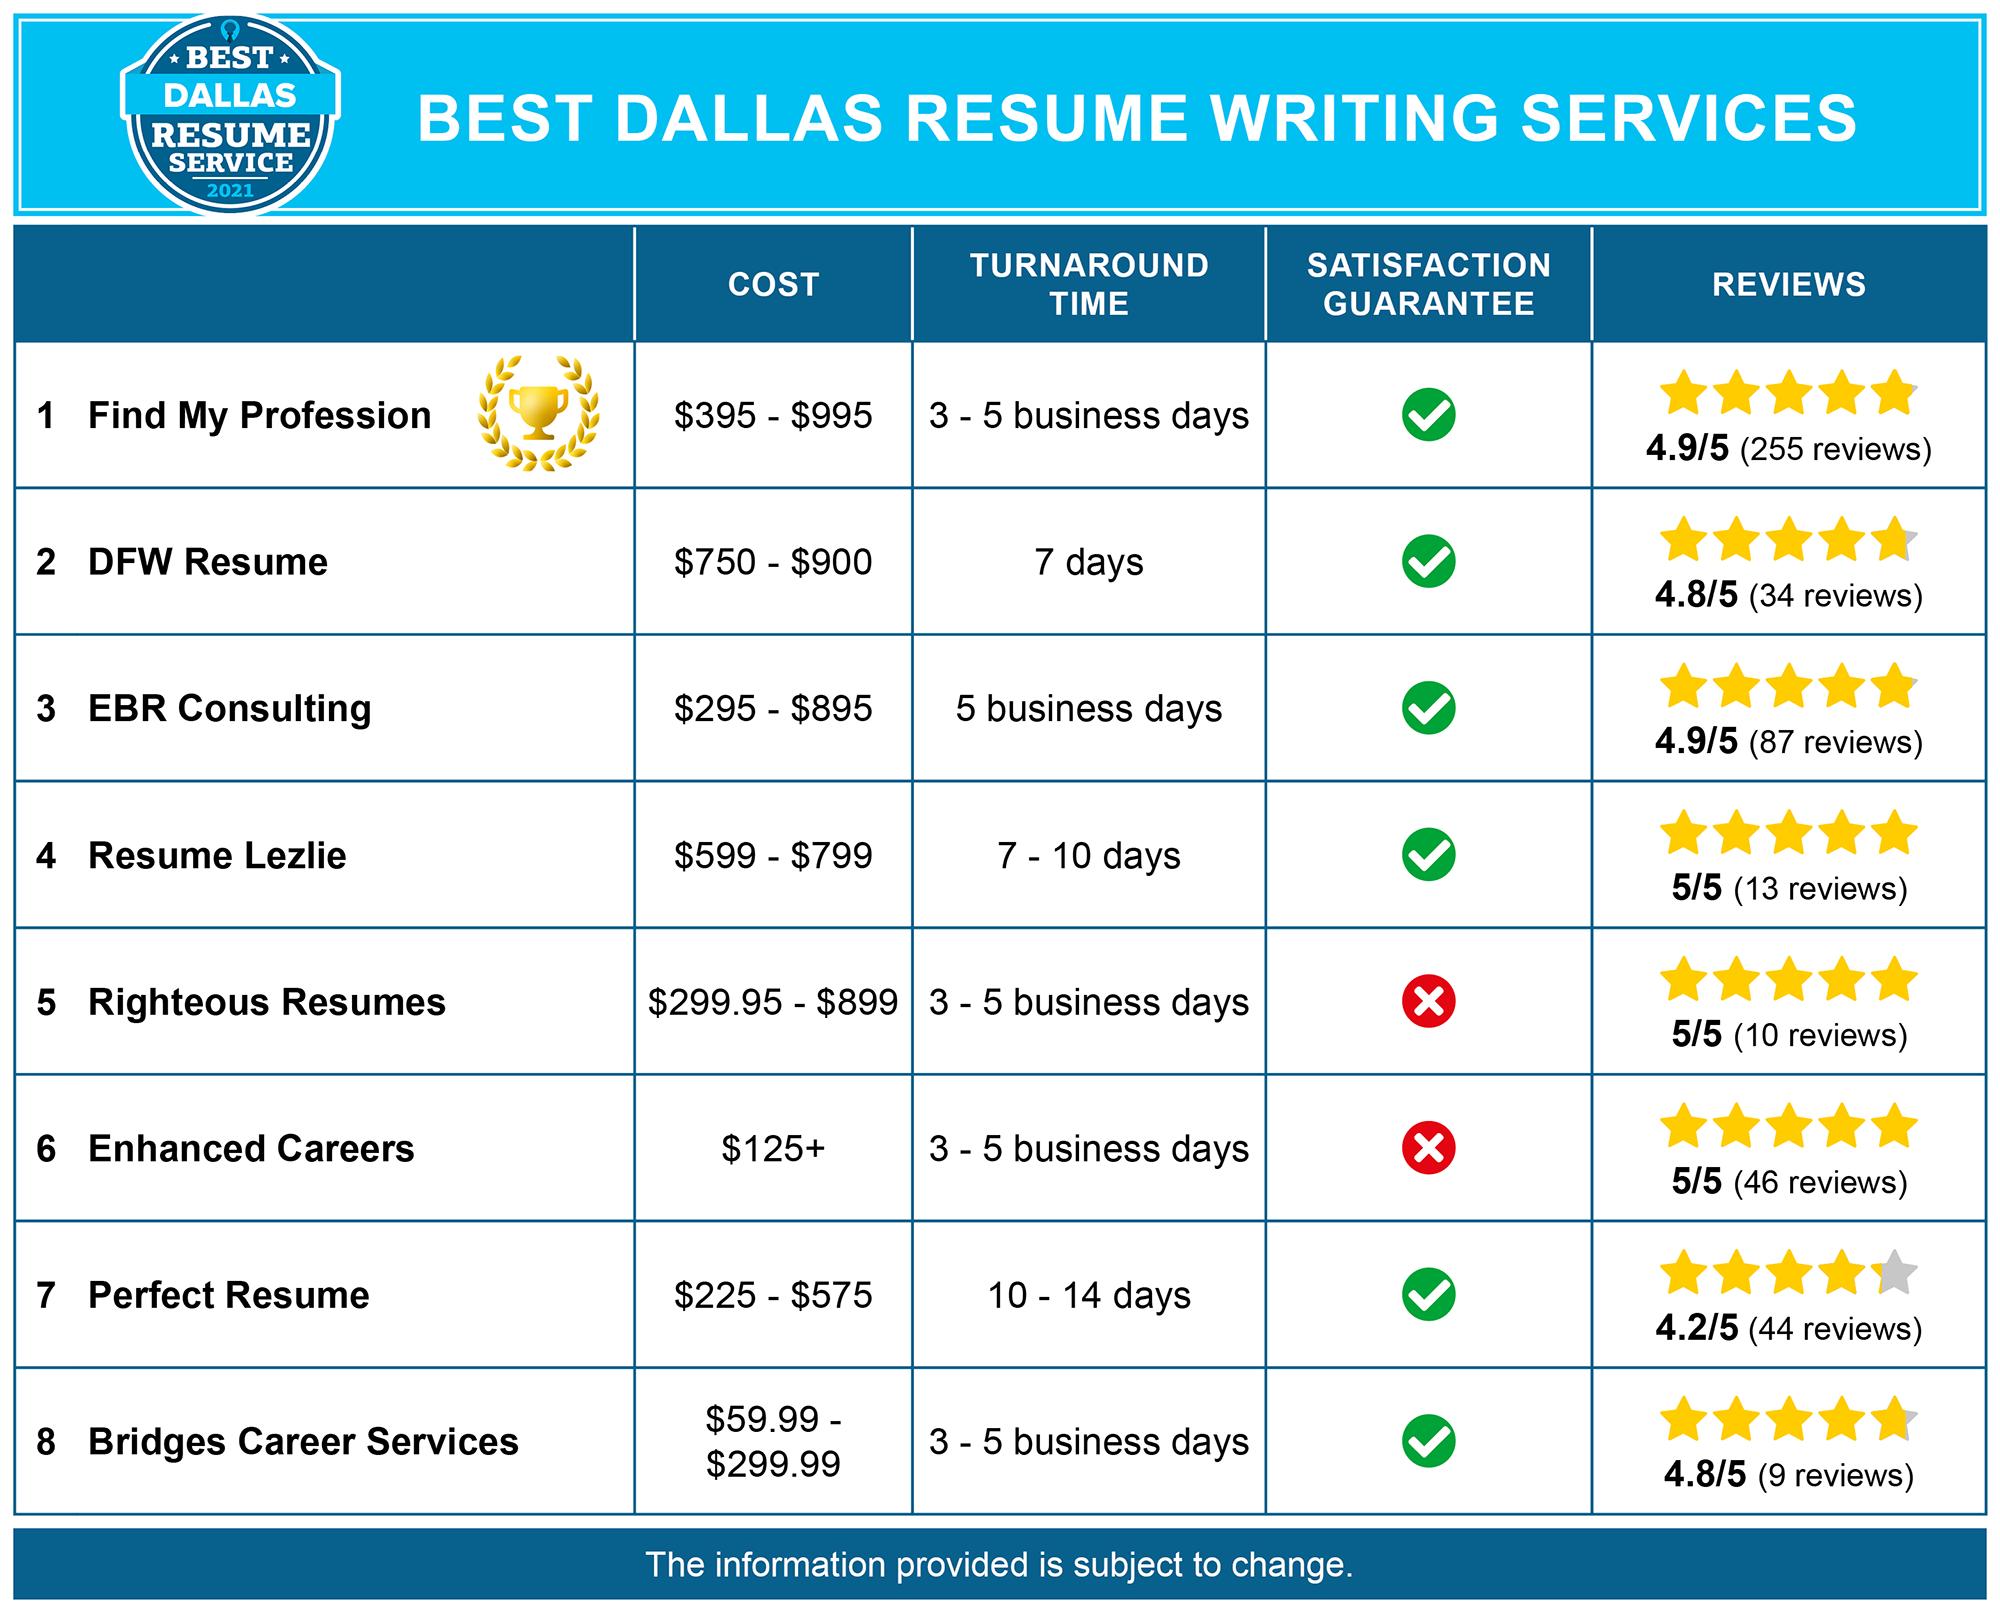 Best Dallas Resume Services